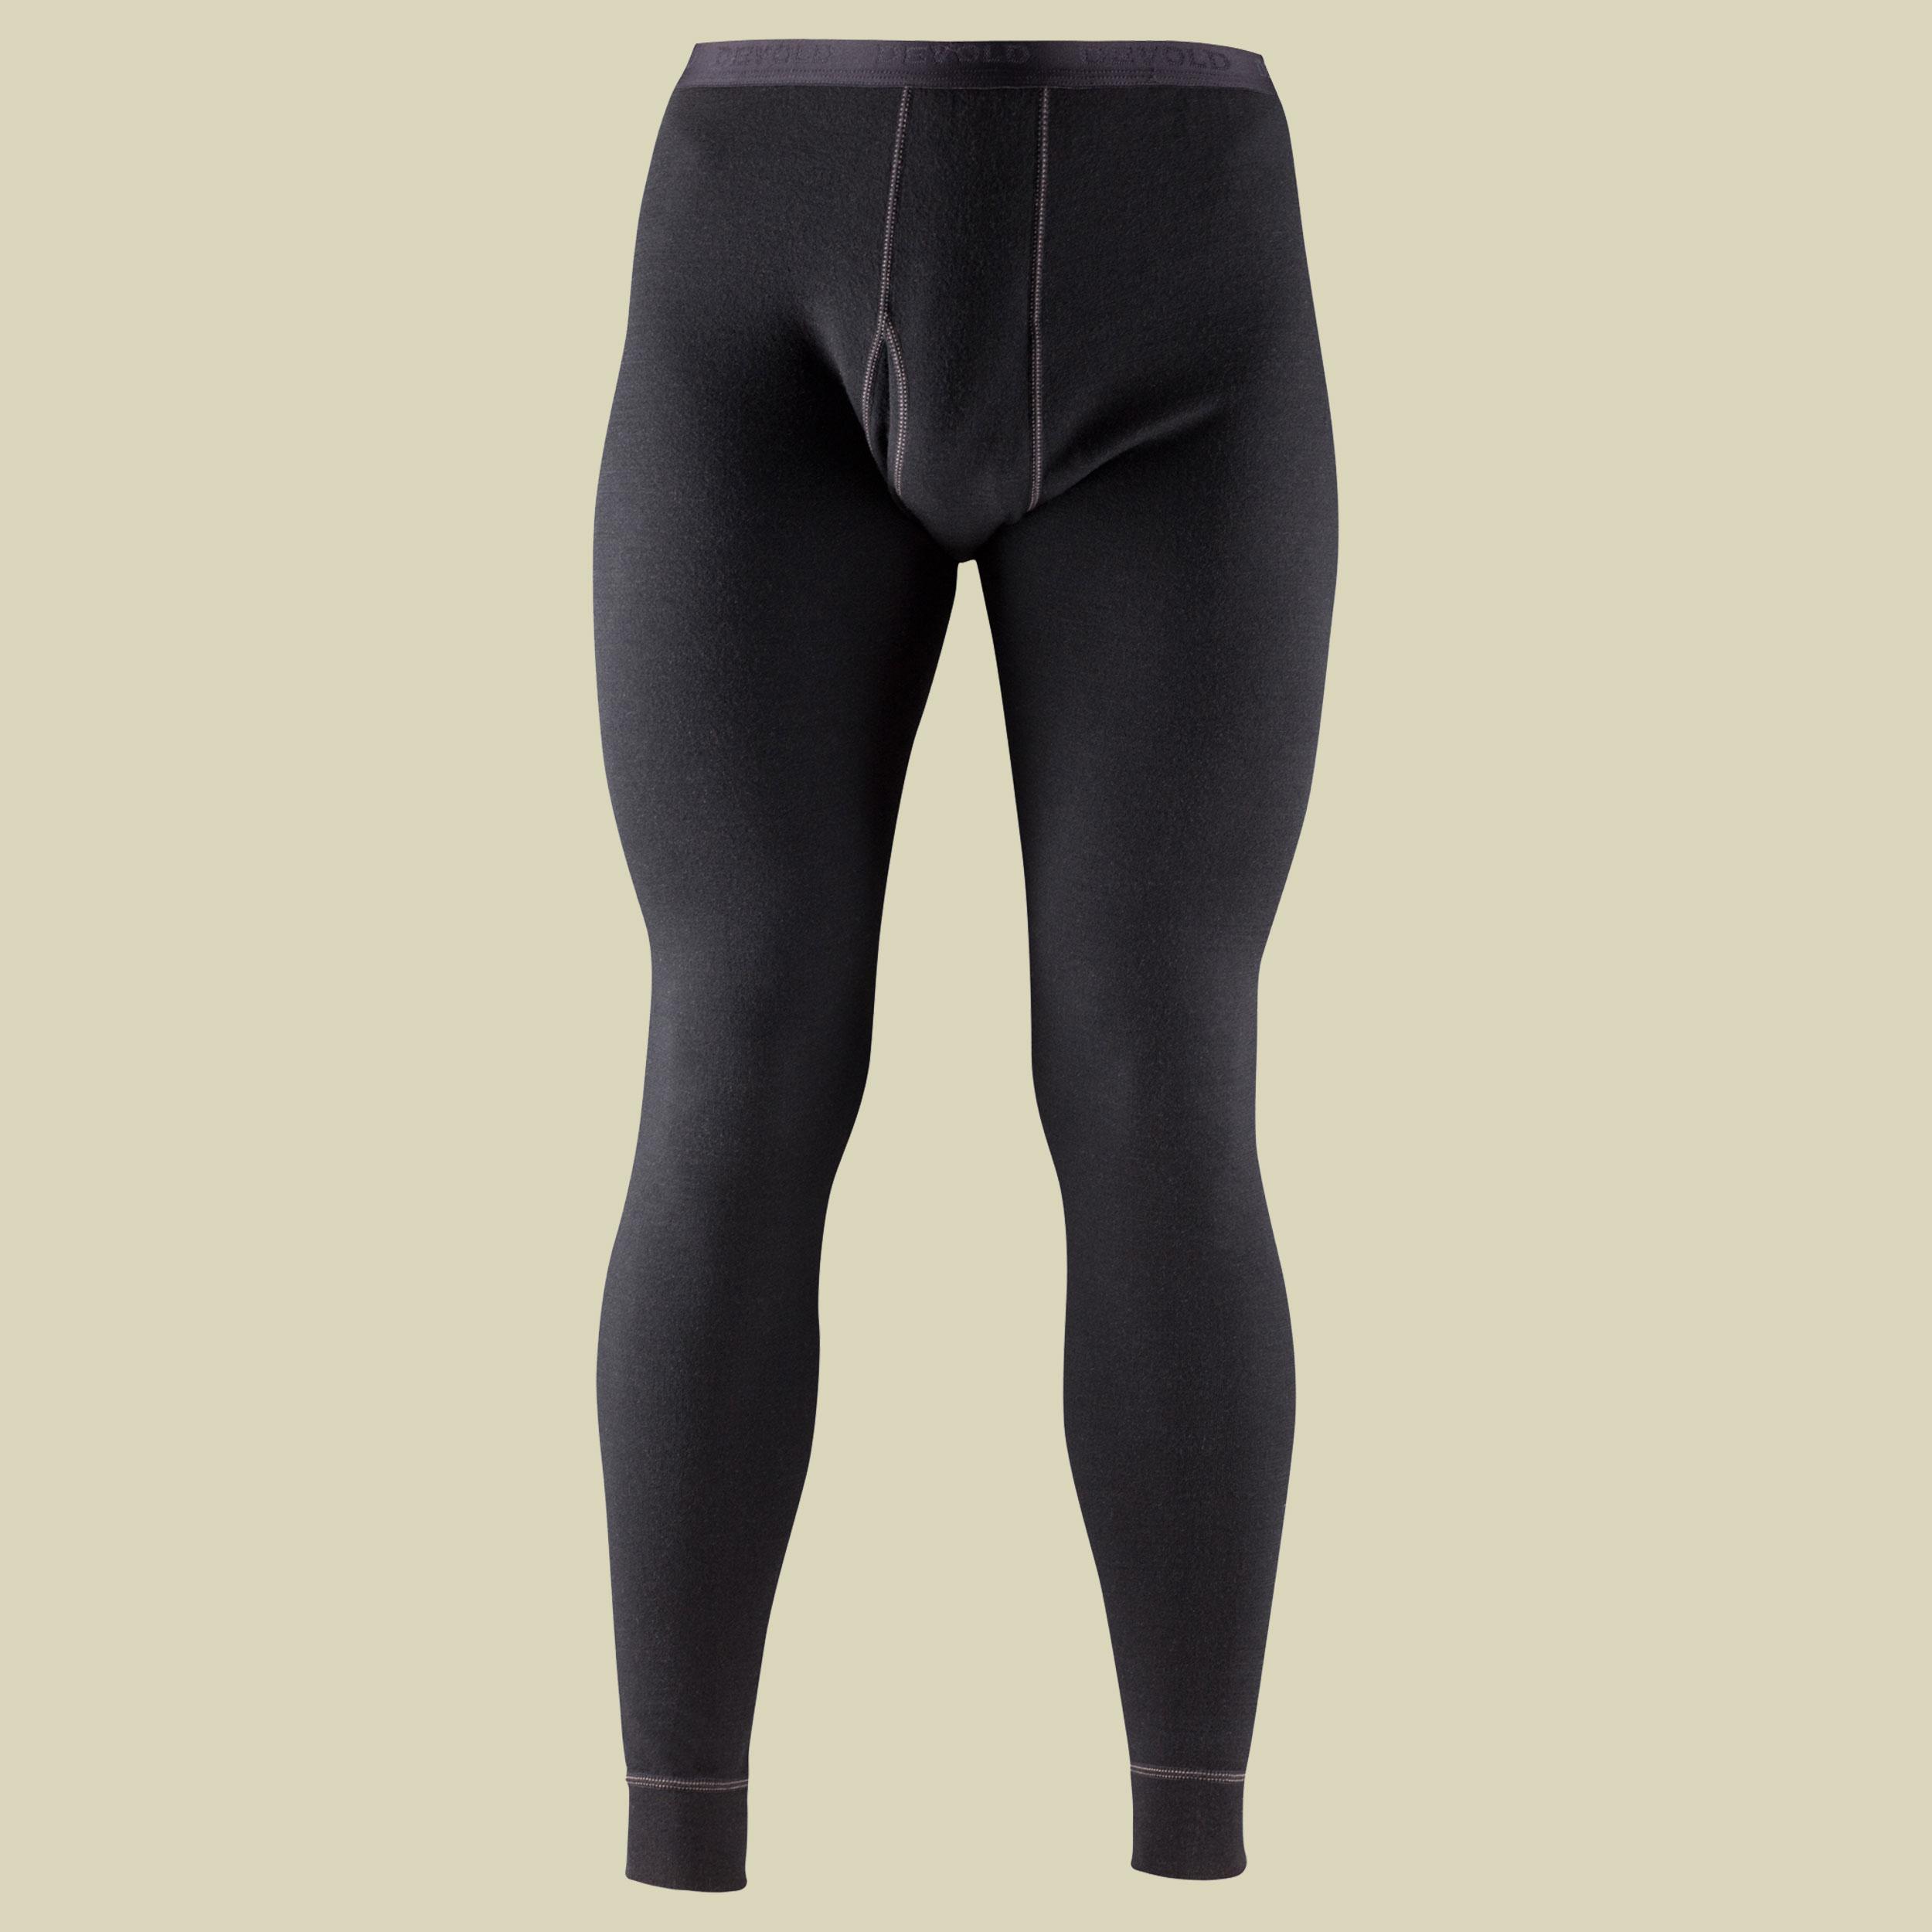 lange unterhose herren panties boxershort modal lycra. Black Bedroom Furniture Sets. Home Design Ideas